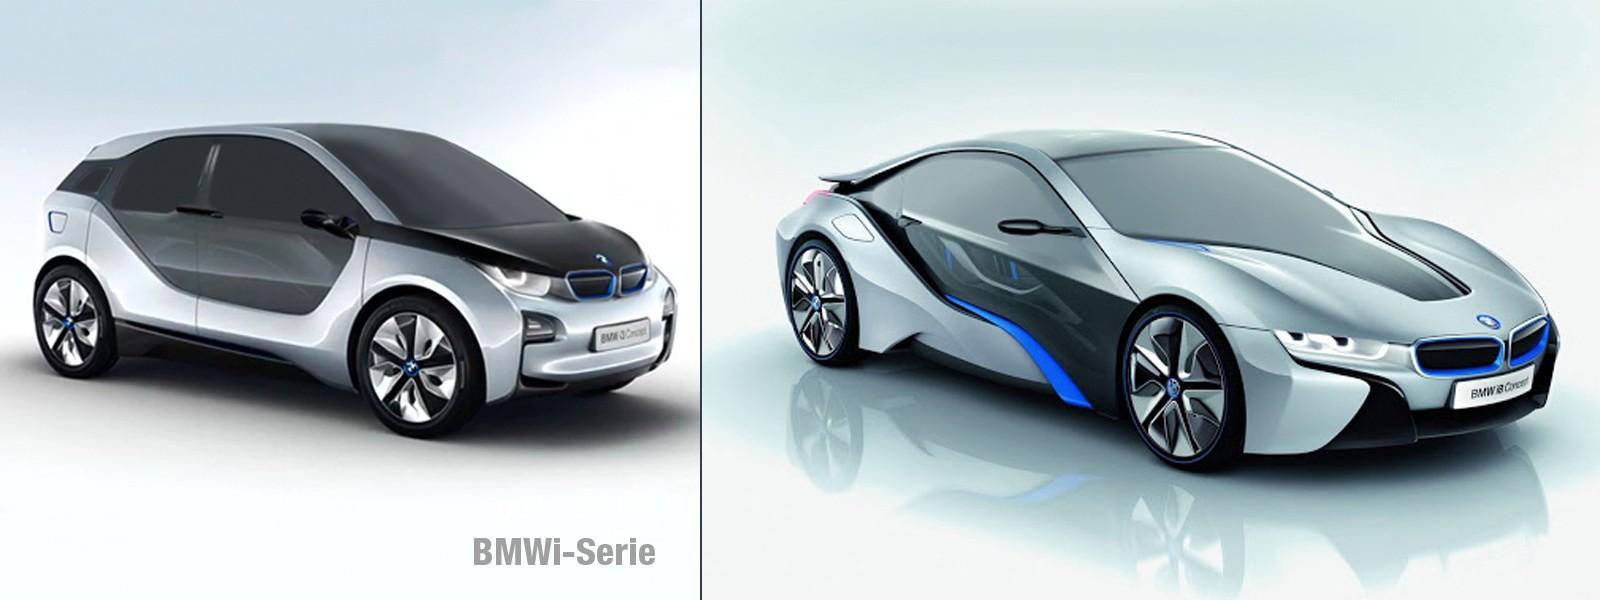 BMWi Series